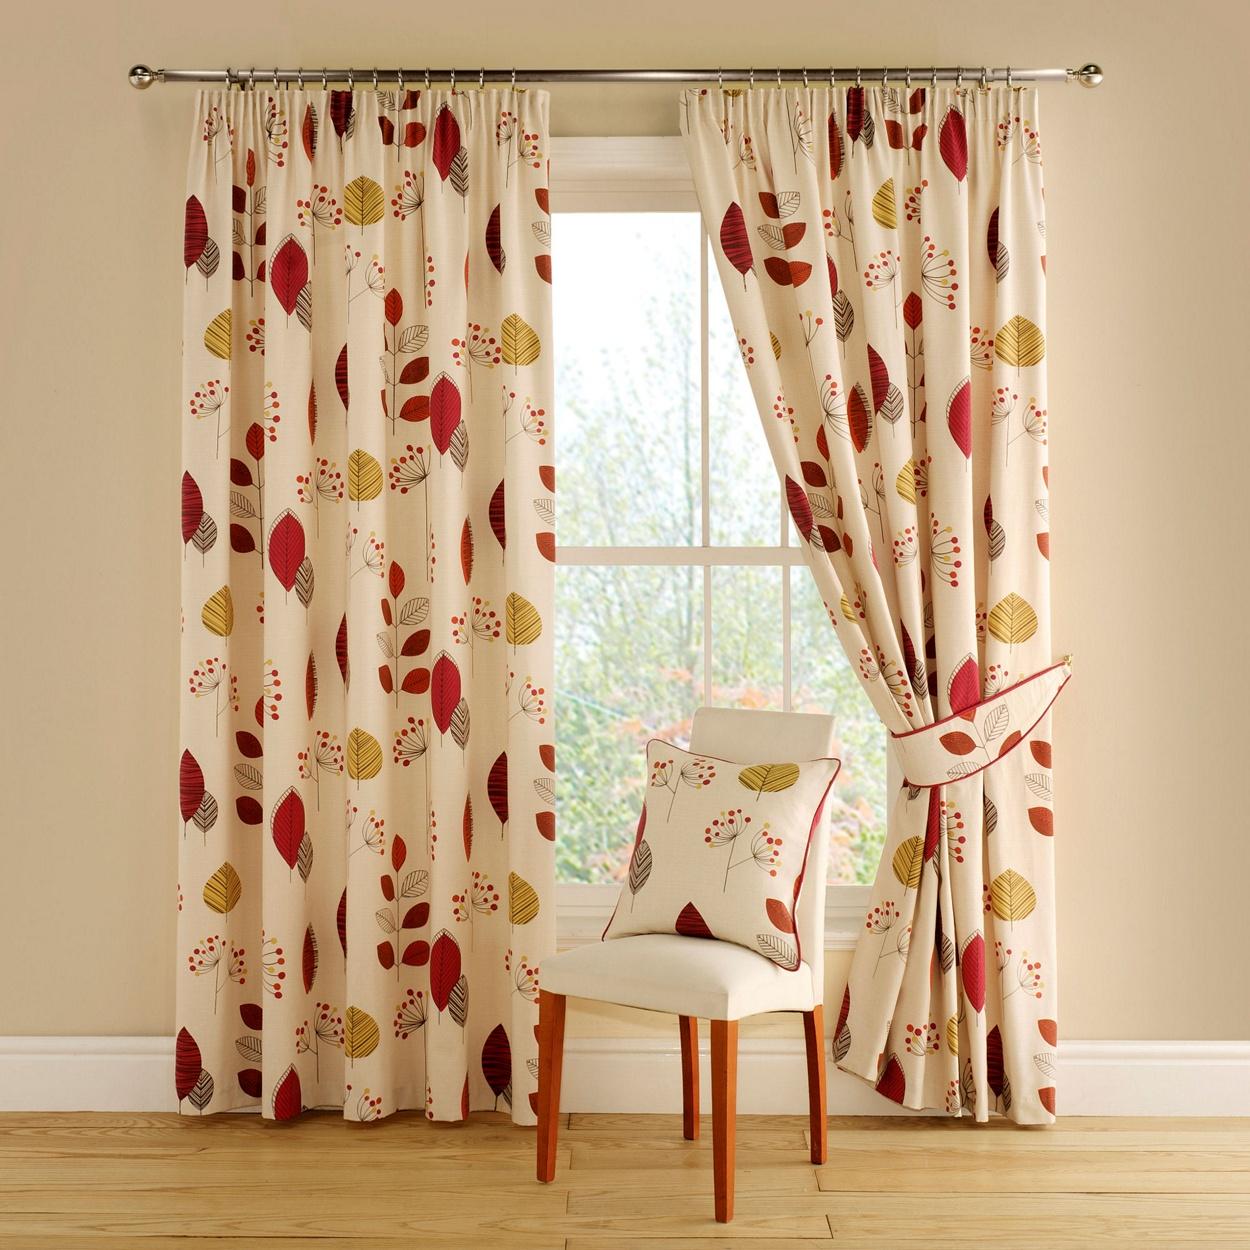 Debenhams Made To Measure Curtains Review Curtain